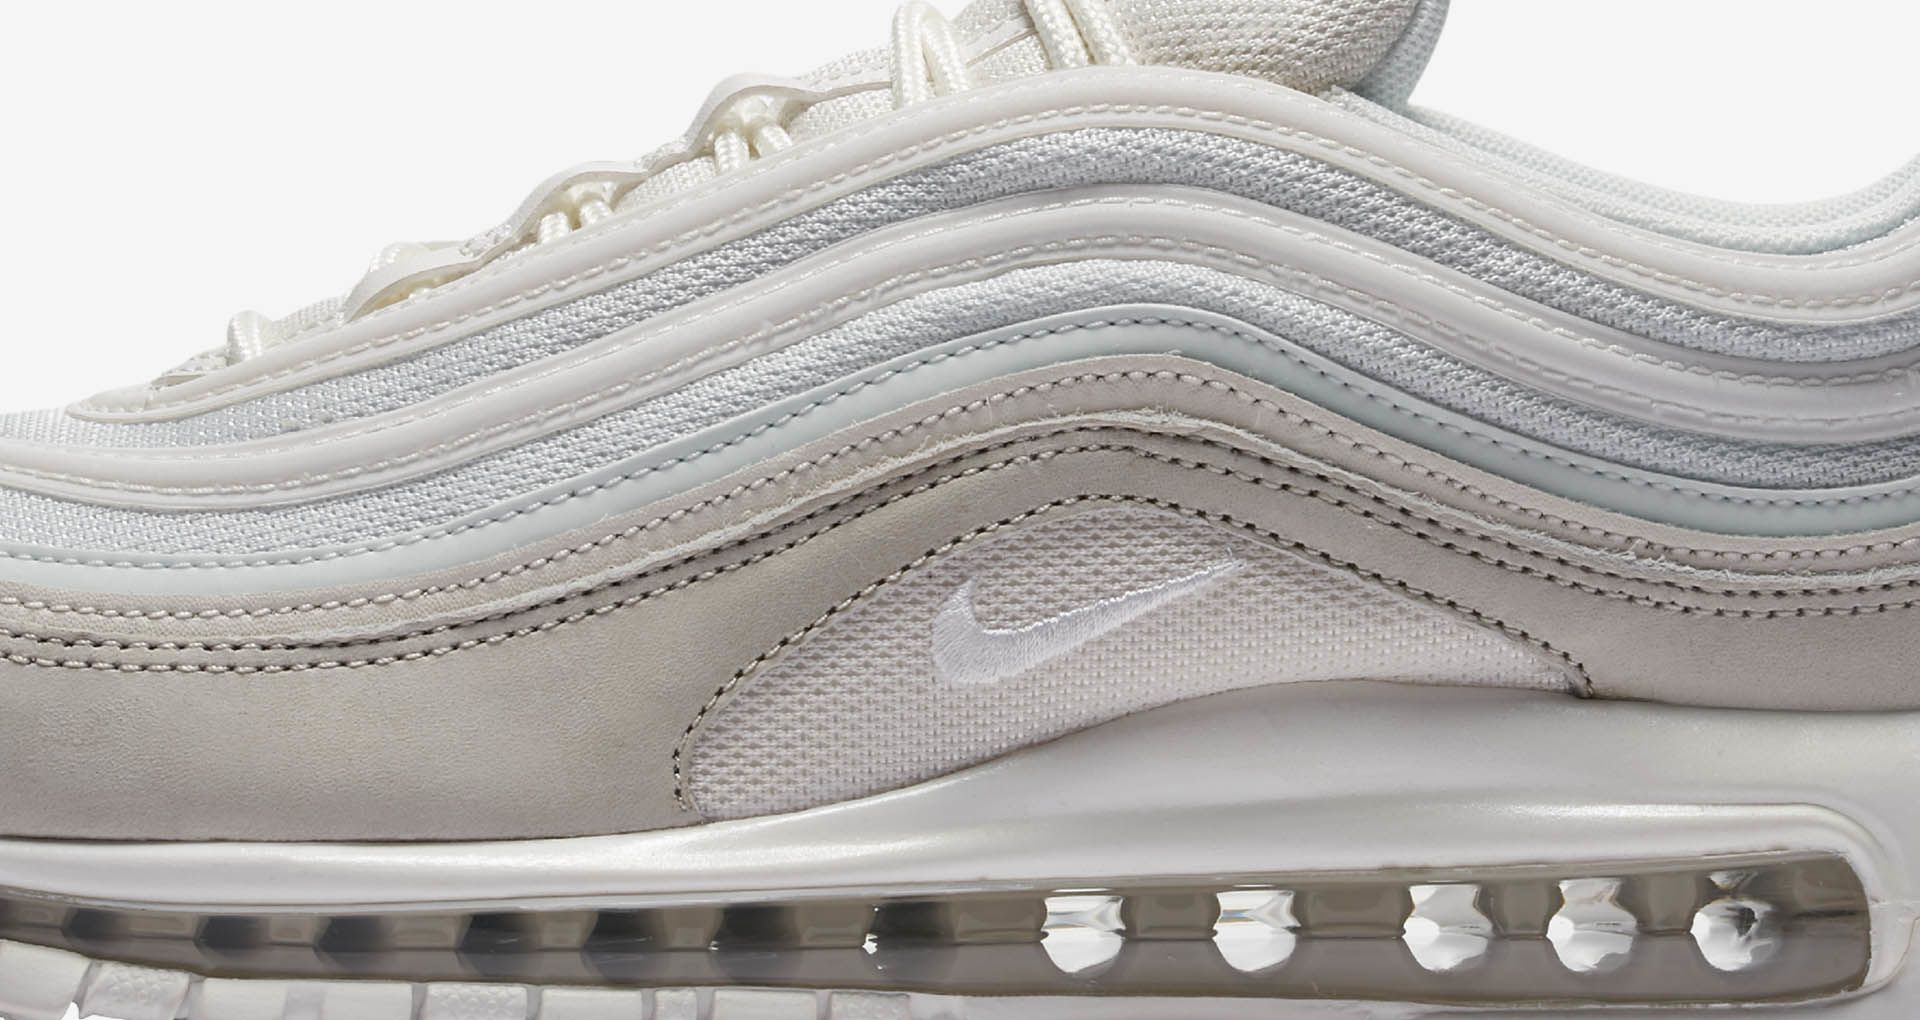 Nike Air Max 97 Premium 'Light Bone' Release Date. Nike